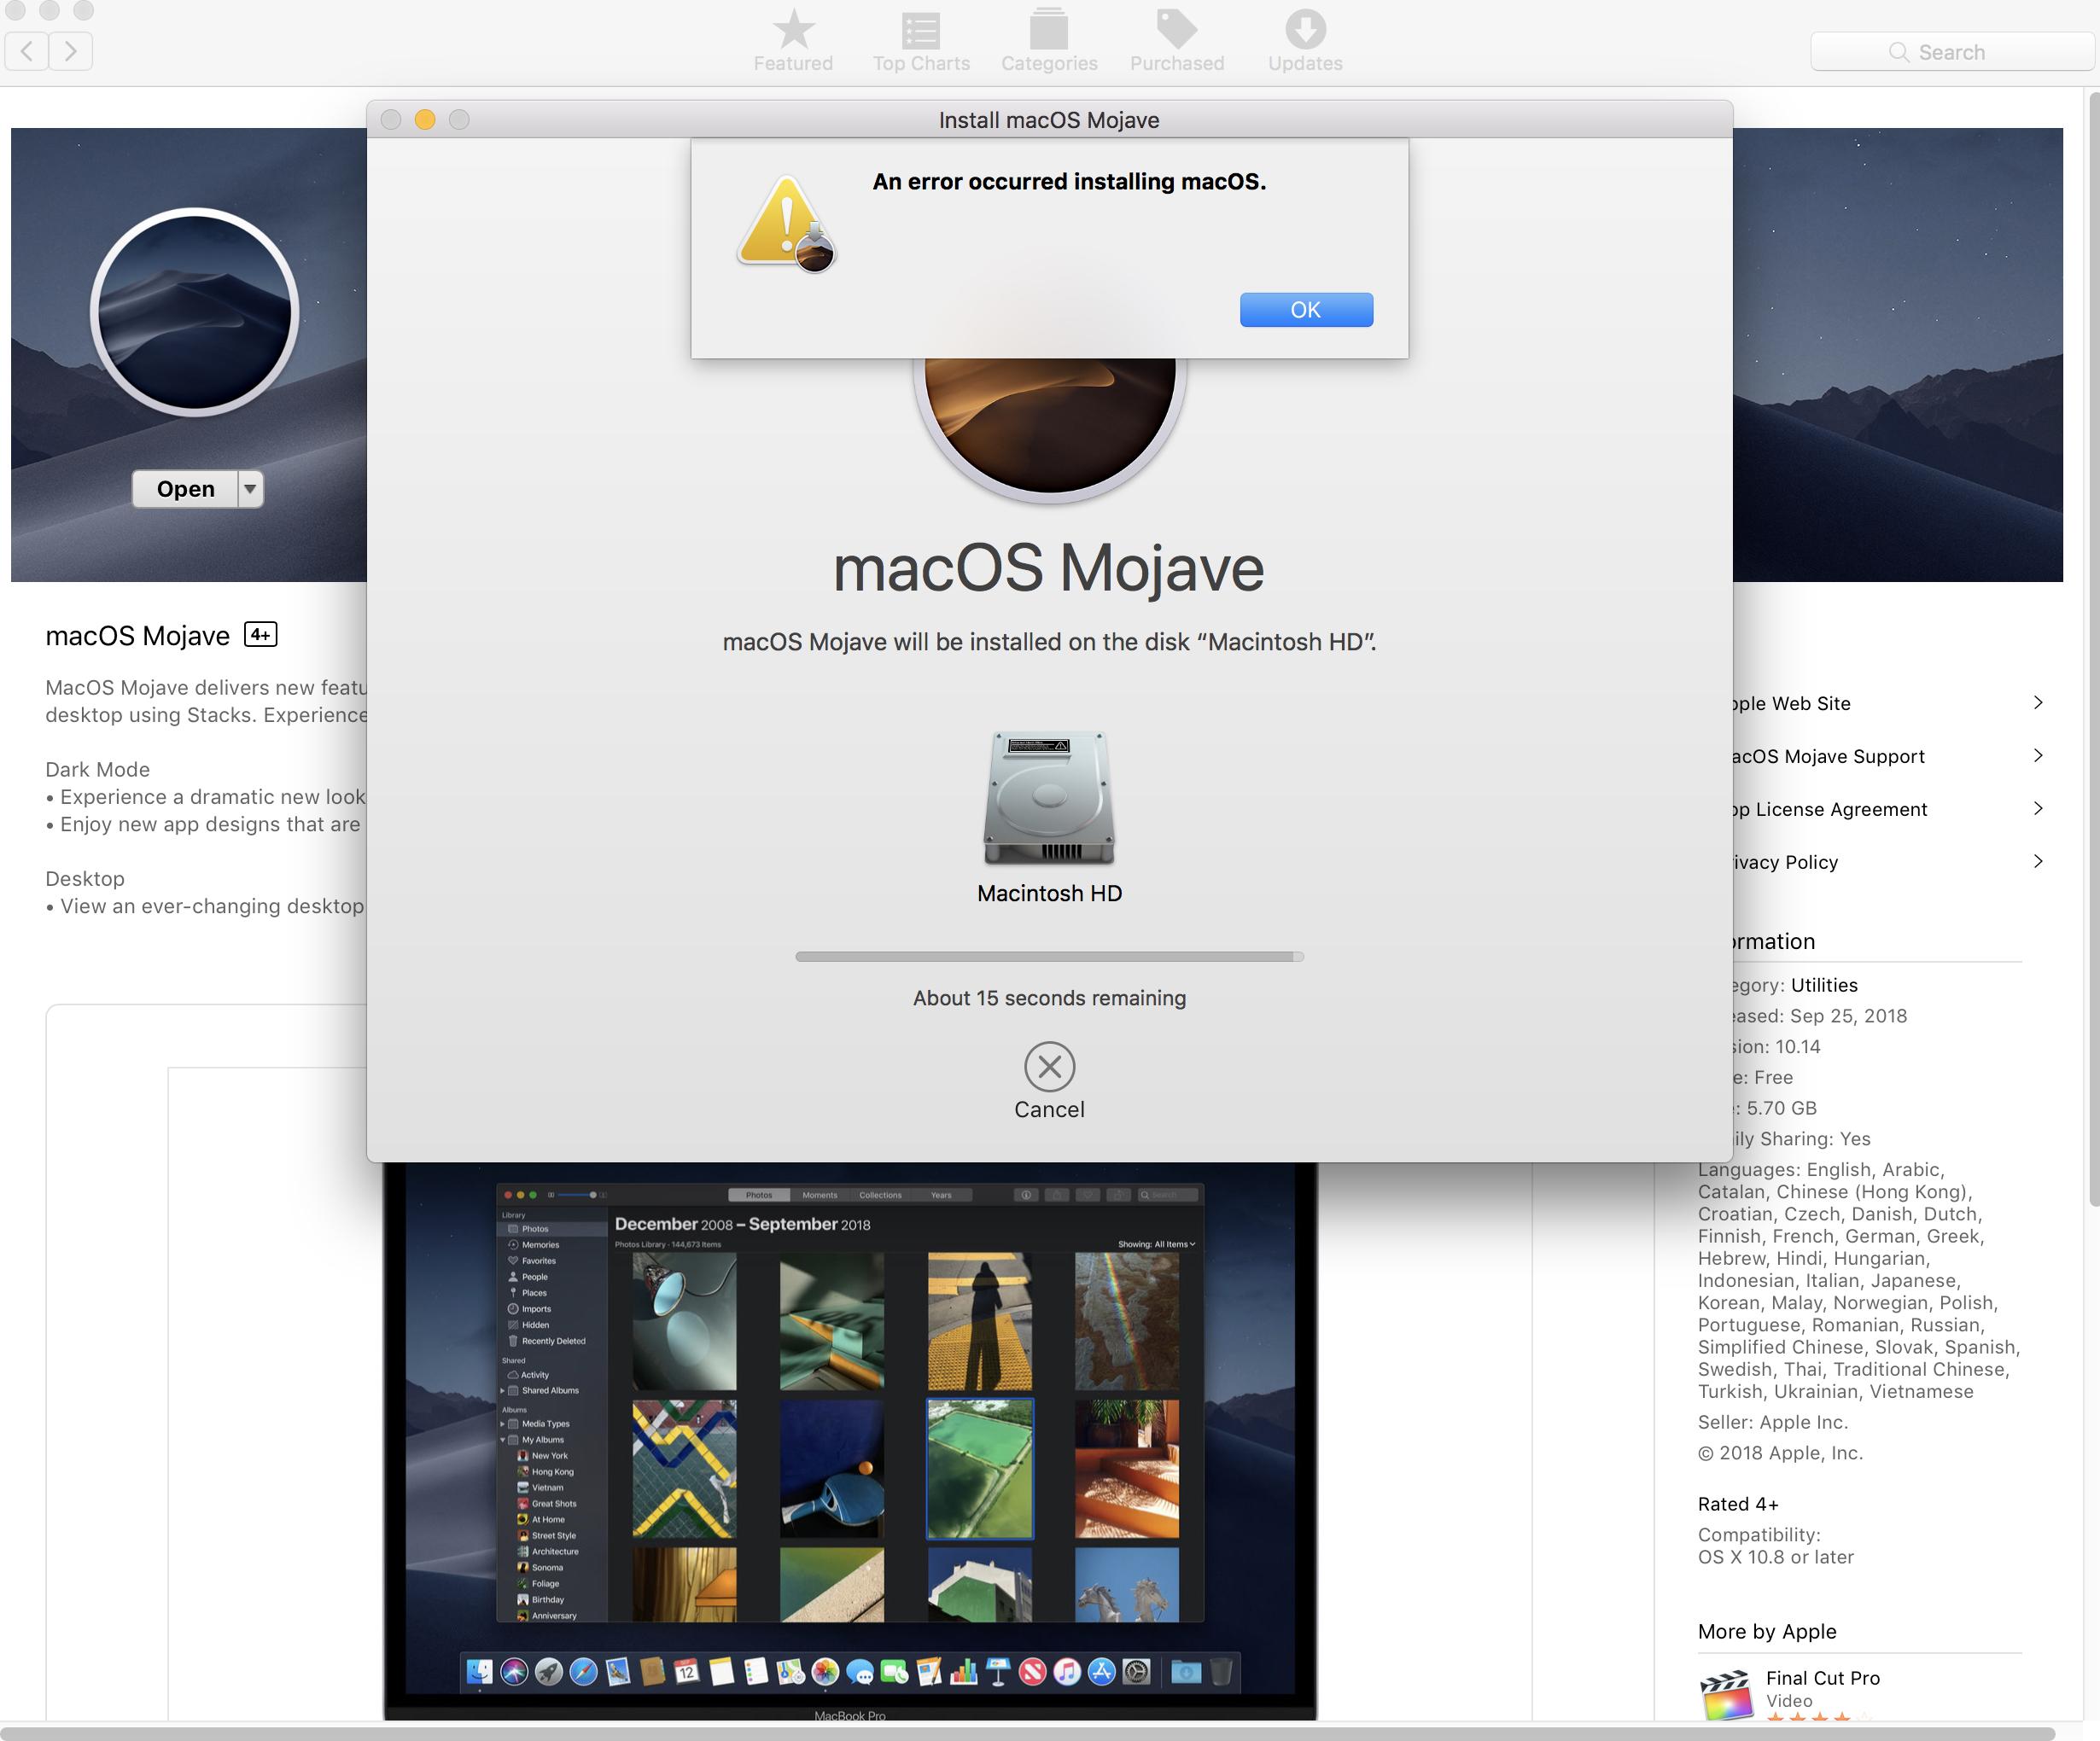 An error occurred installing macOS in Moj… - Apple Community